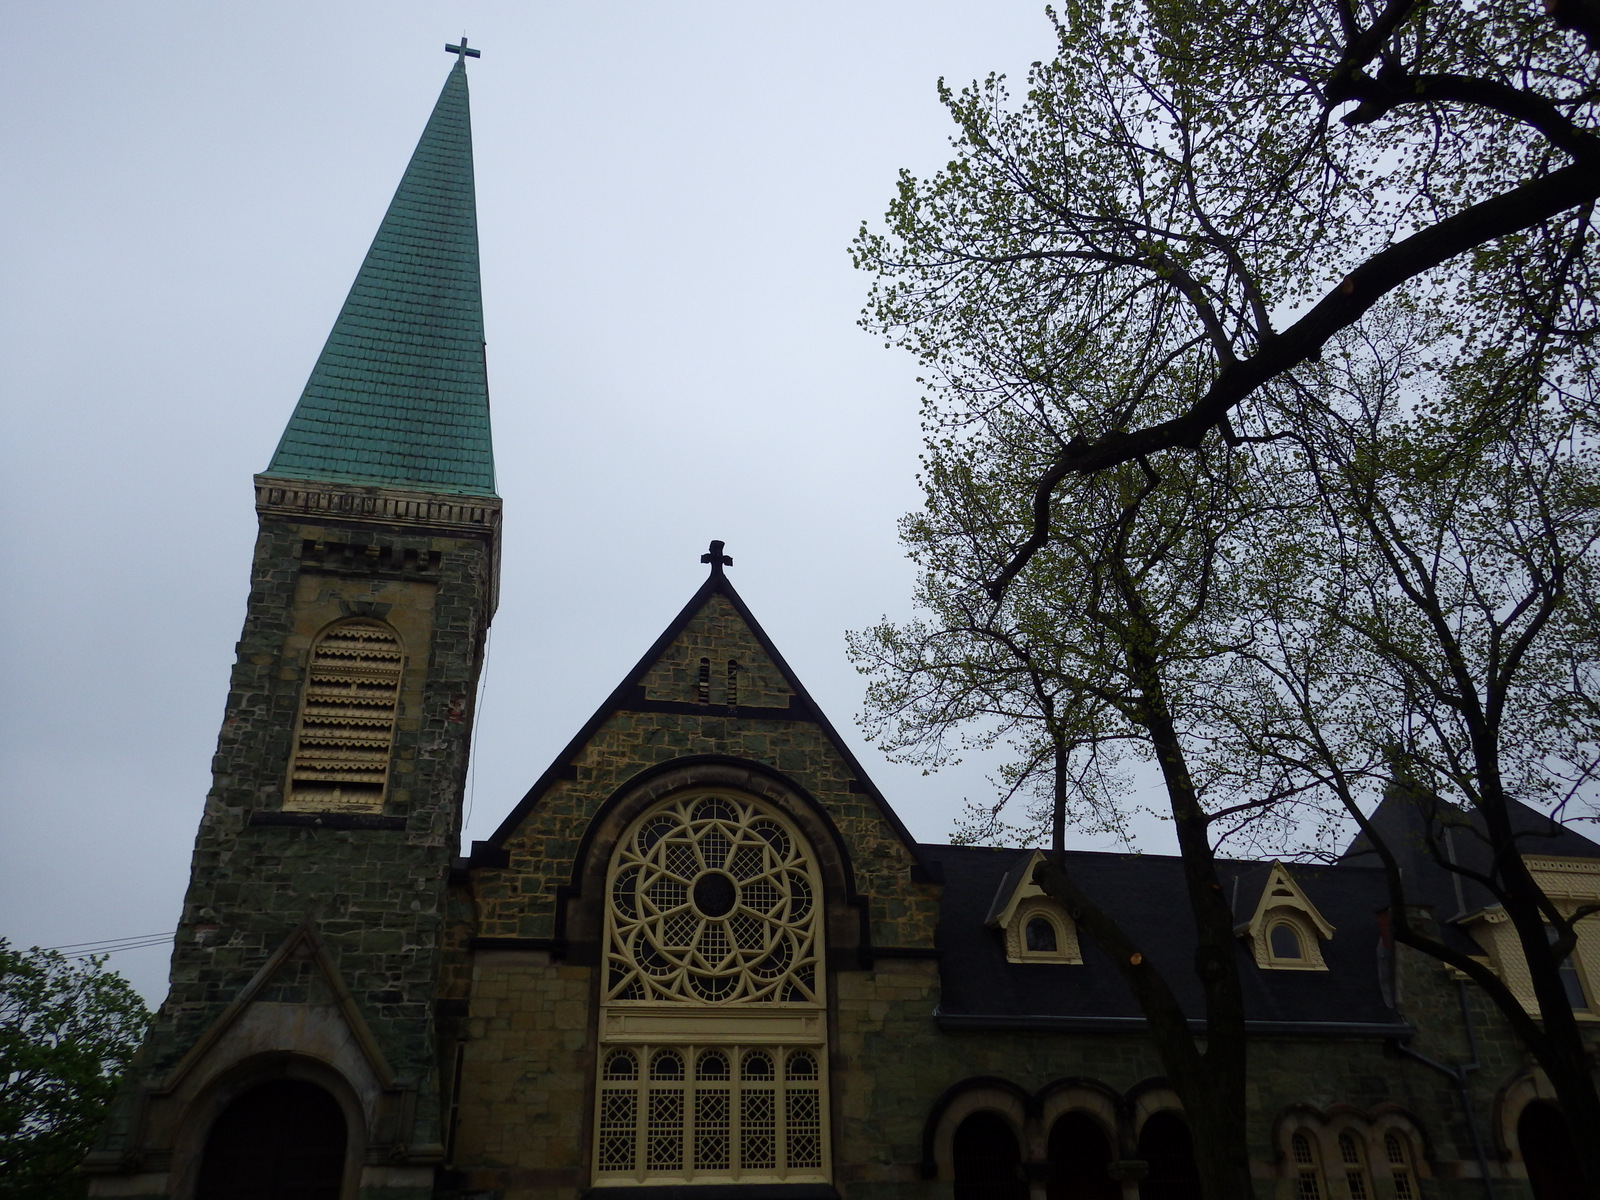 The green rock church